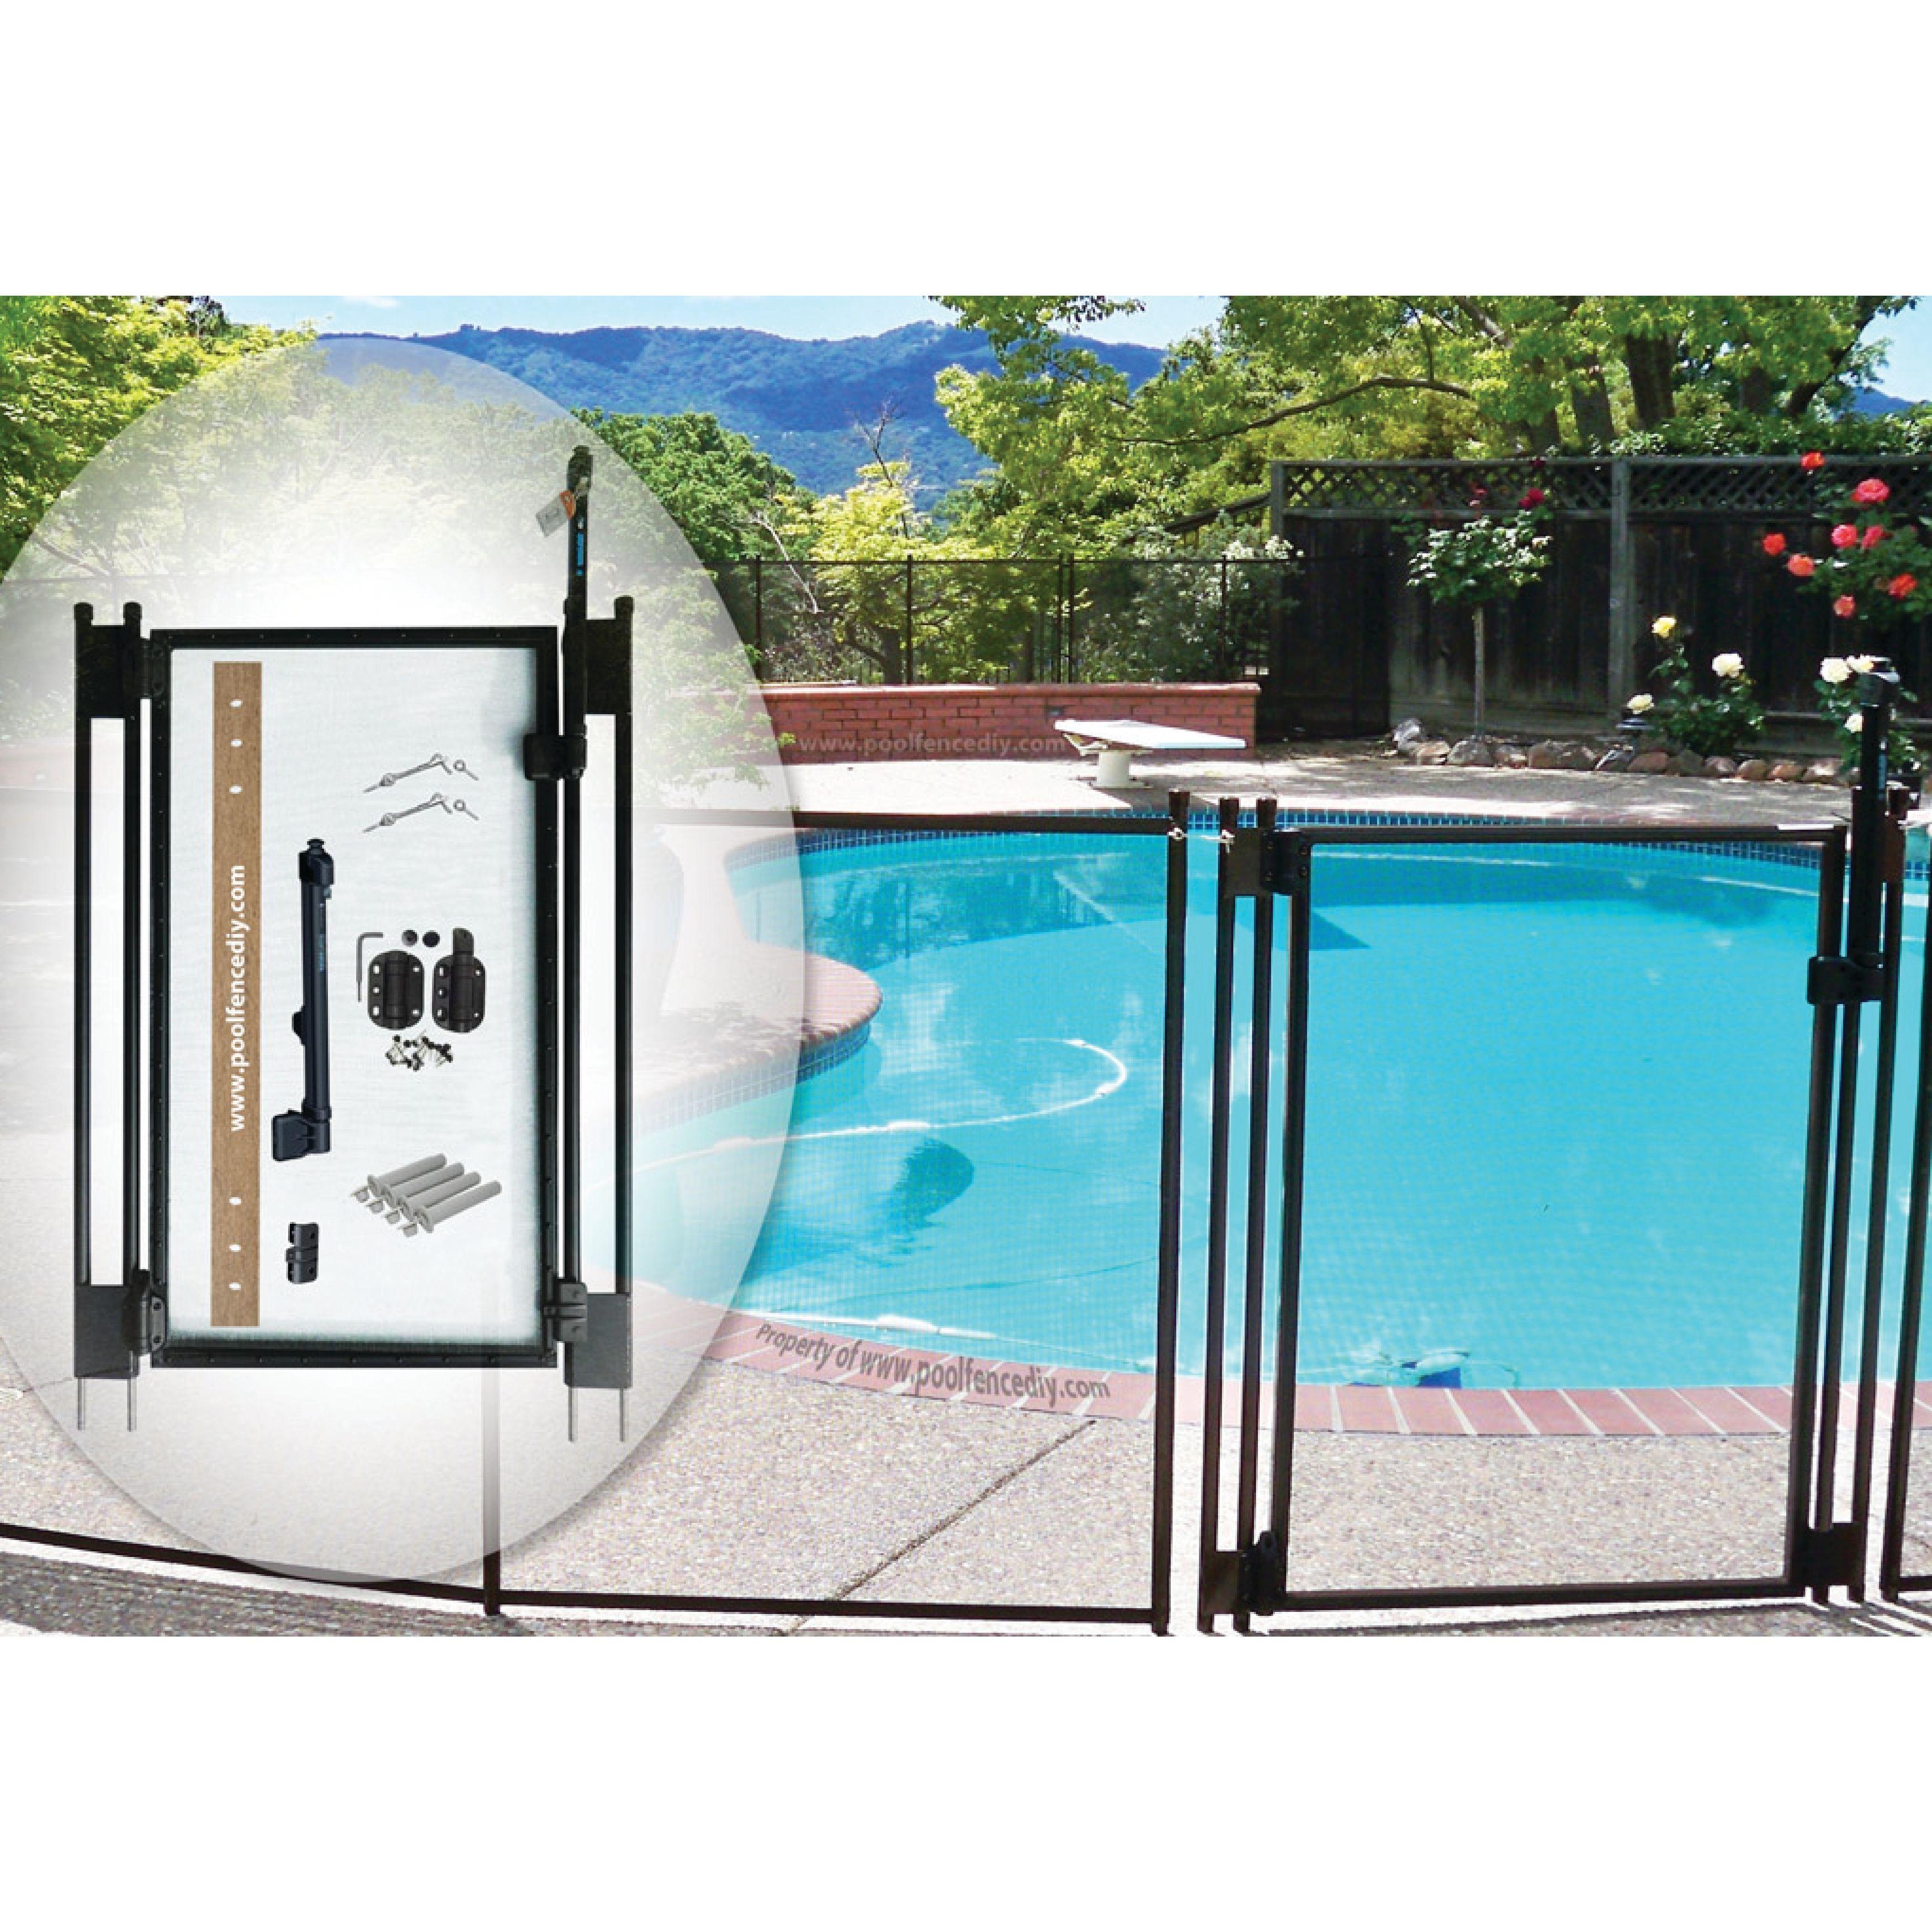 Self Closing Gate Kit By Pool Fence Diy Diy Pool Fence Pool